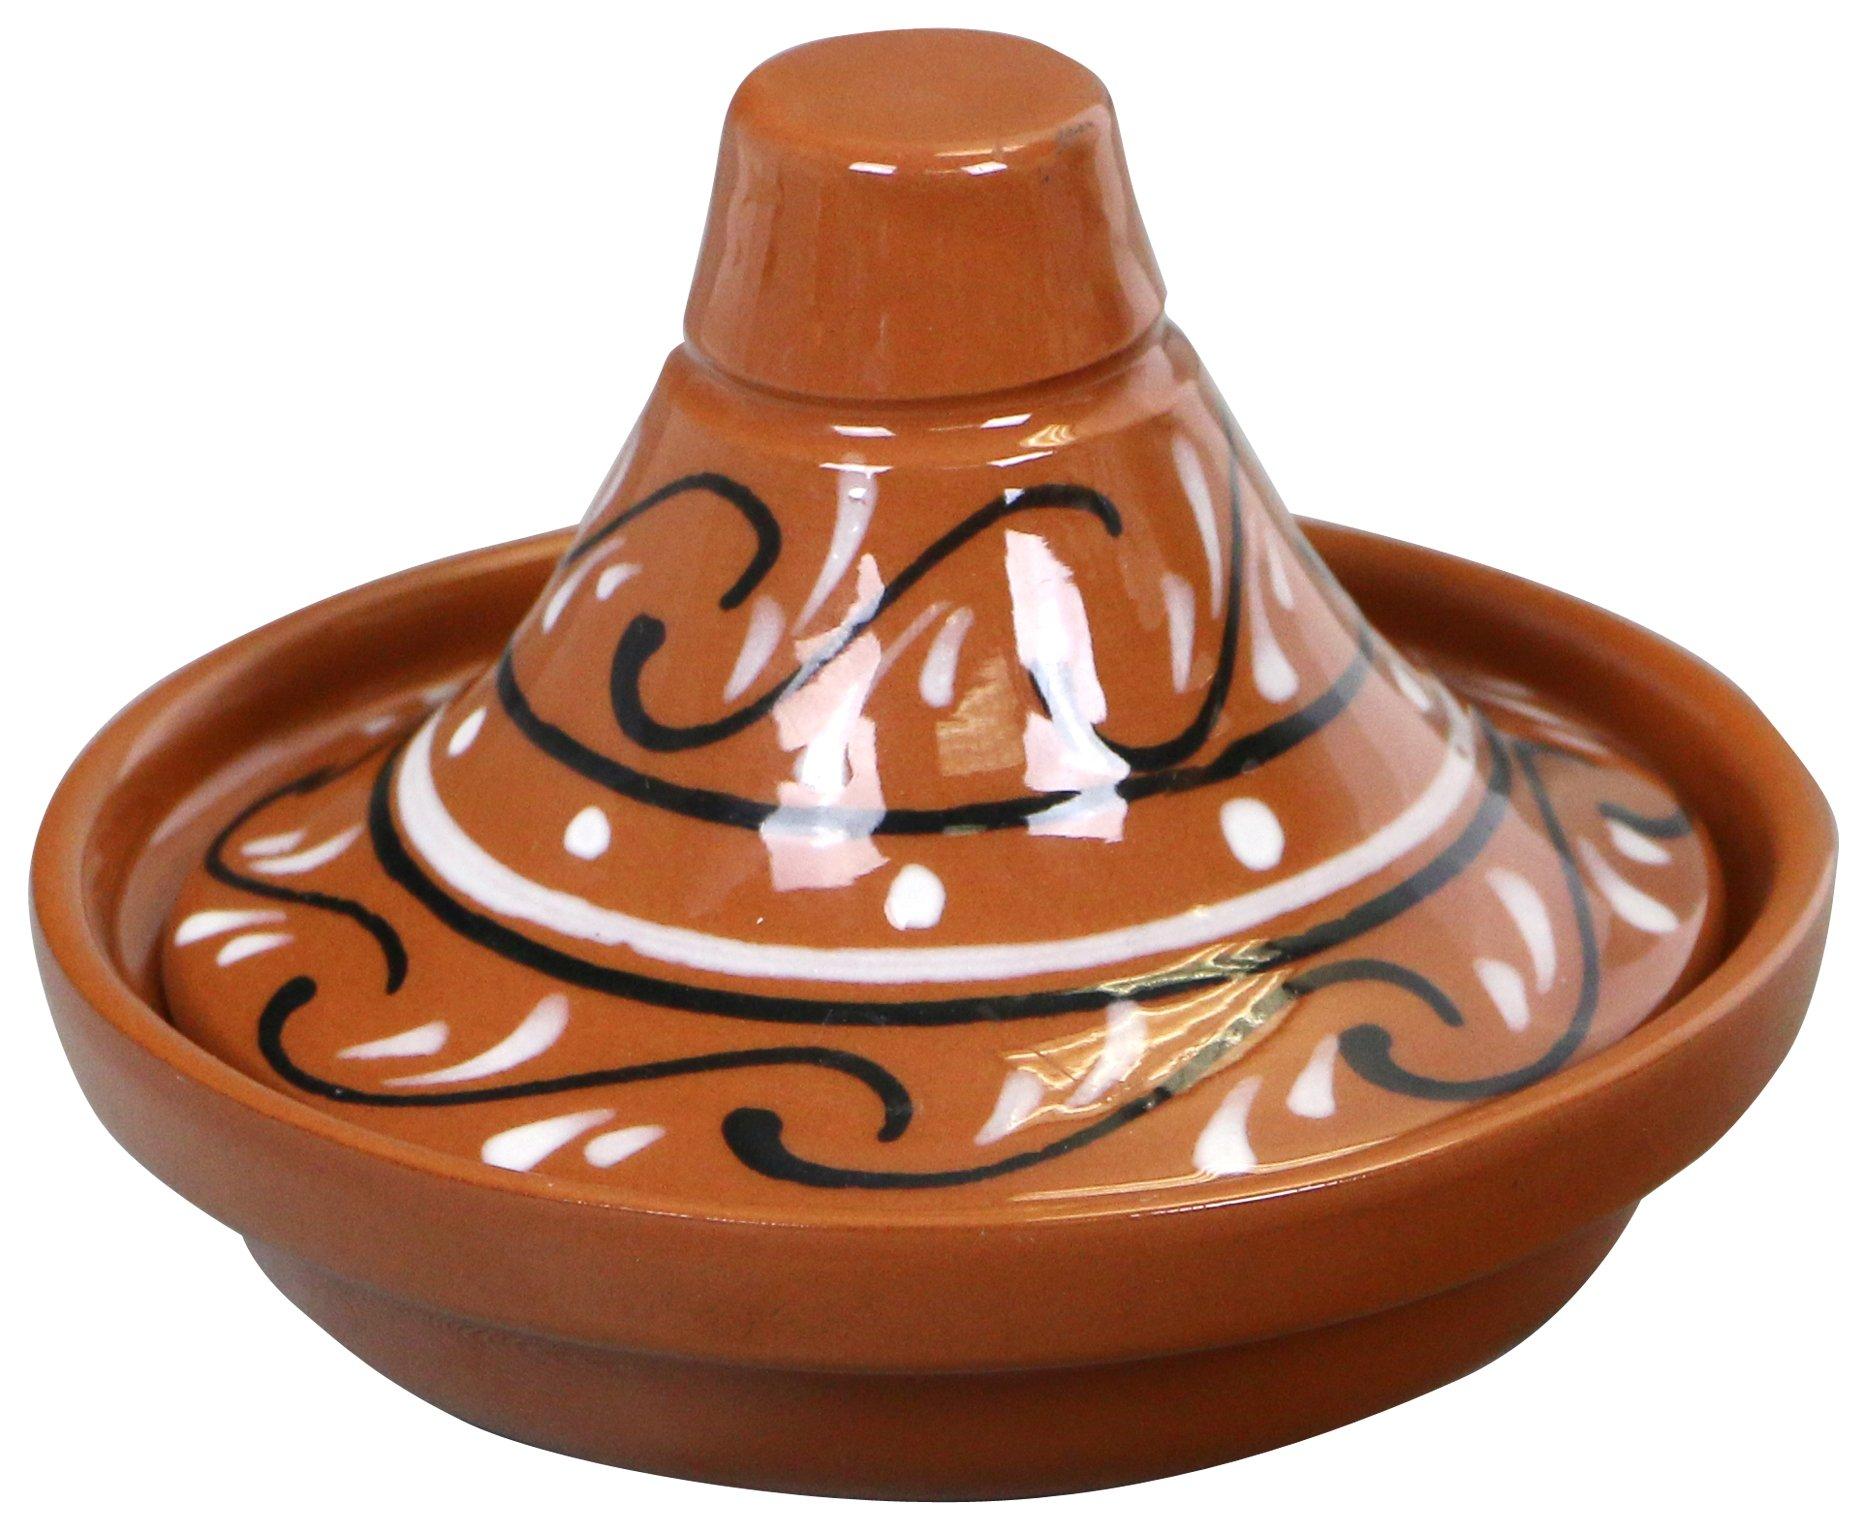 Reston Lloyd Hand Painted Nautral Terra Cotta Mini Tagine, Sauce/Side Dish, Marbela Pattern, Set of 2